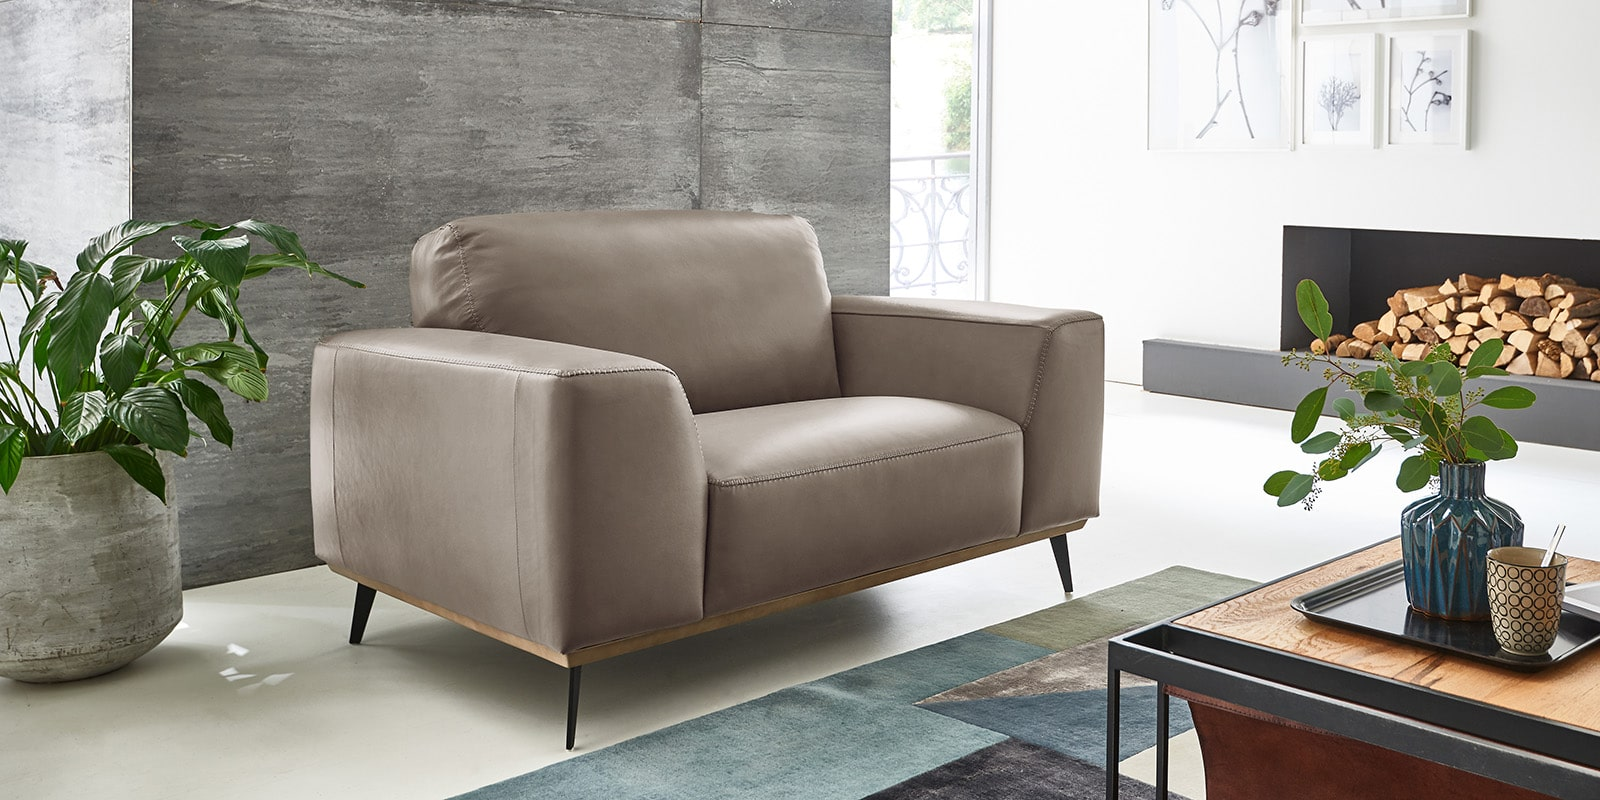 Moebella24 - 1,5-Sitzer - Sessel - Sofa - Barcelona - Leder - Taupe - Skandinavisches - Design - Punto - cavallo - Nähte - Elegante - Füße